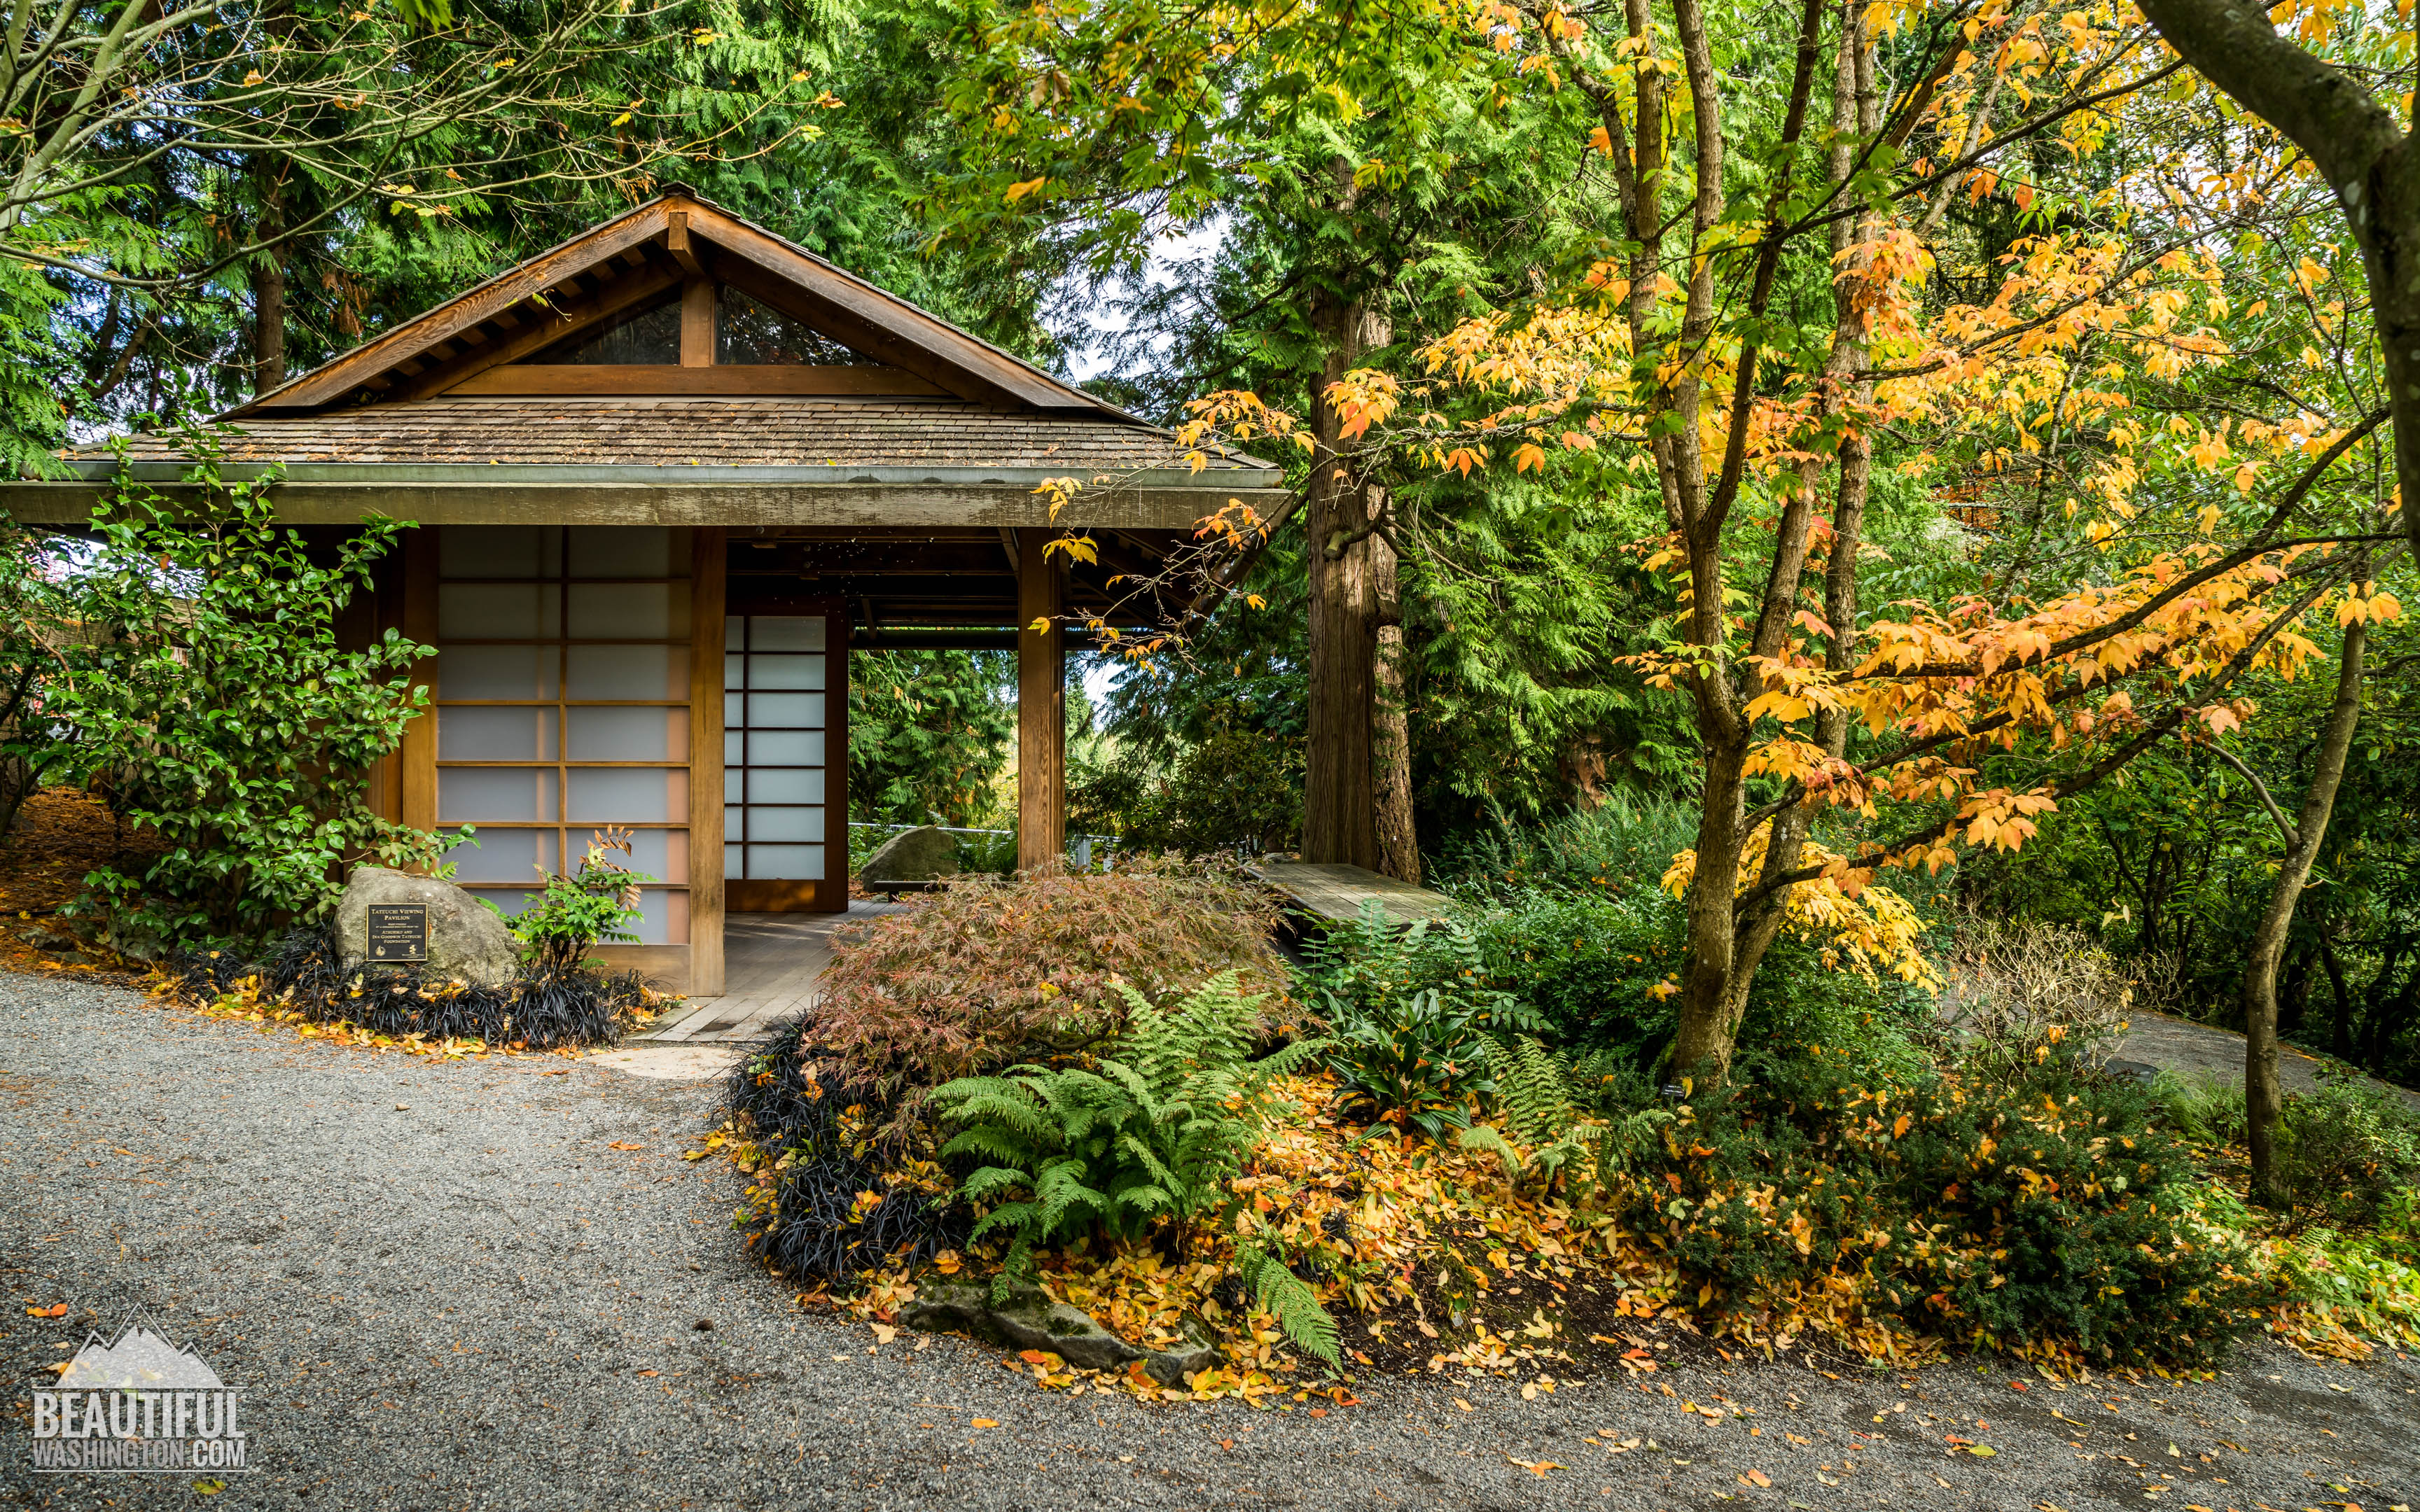 Bellevue botanical gardens hours bellevue botanical for Botanical gardens hours